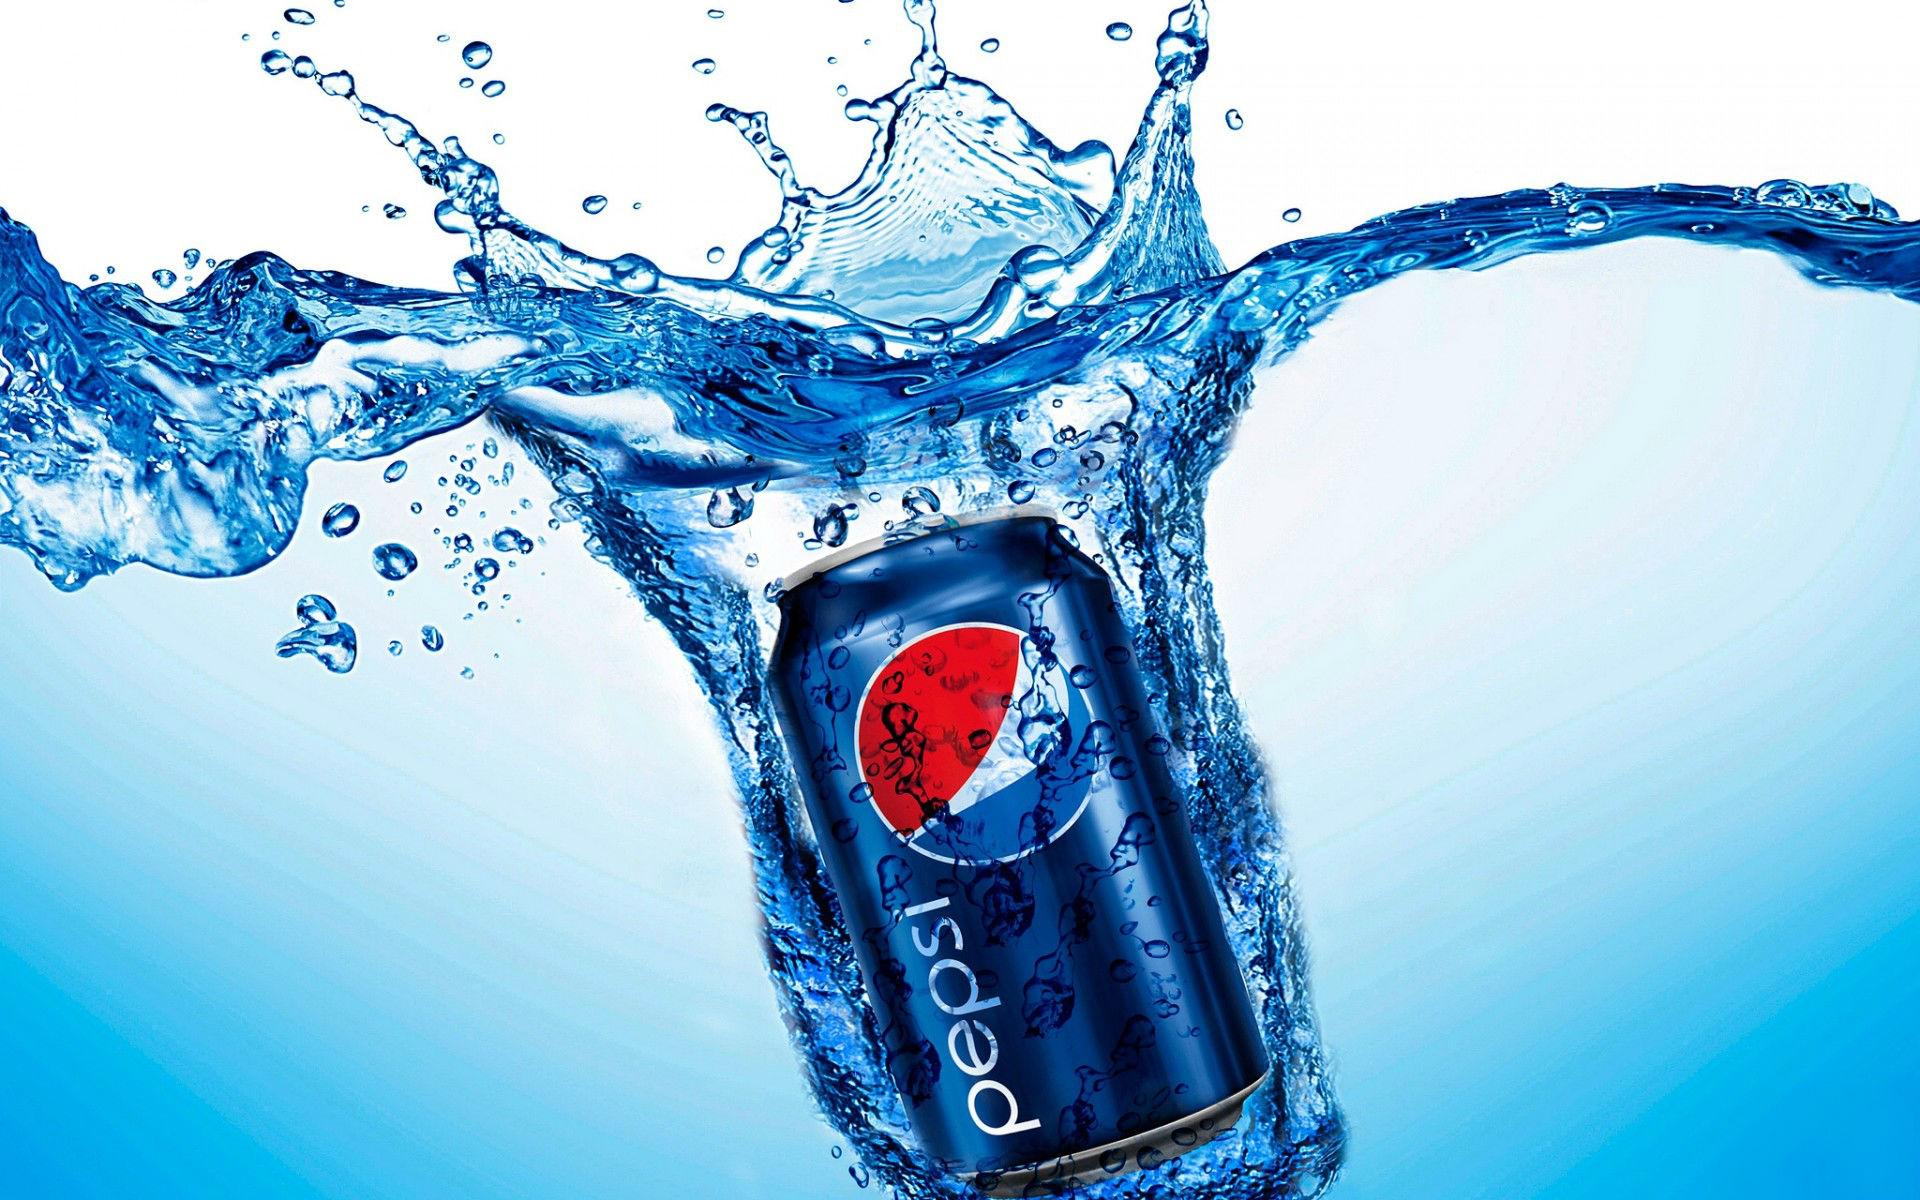 Pepsi logo HD Wallpapers 1920x1200